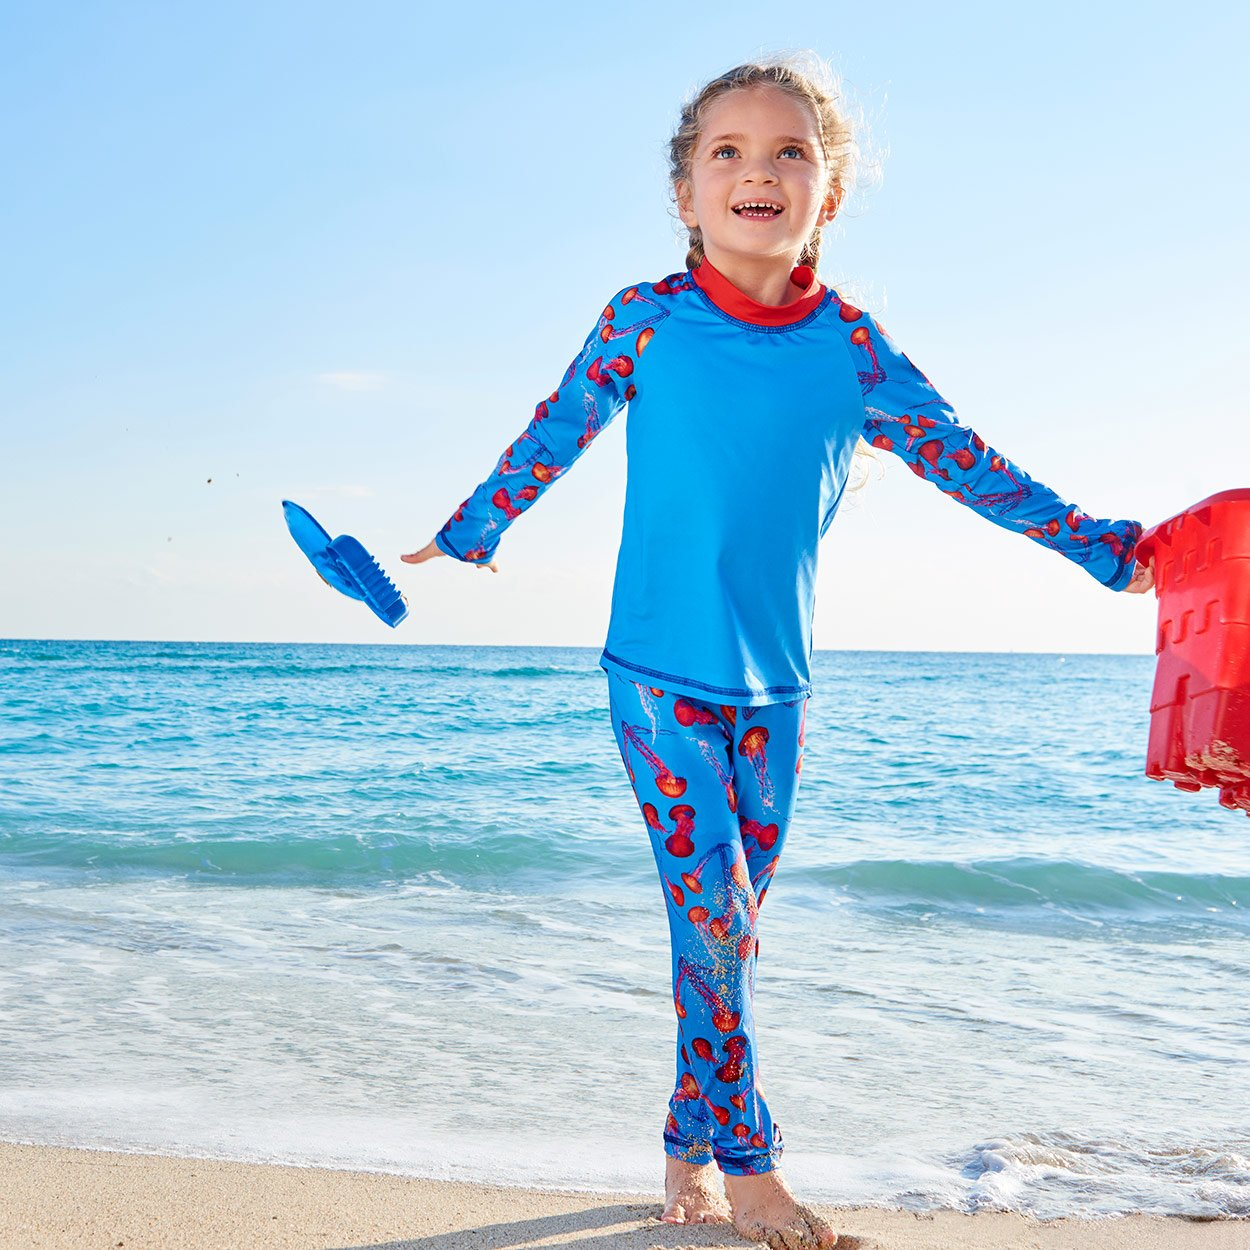 Red Jellyfish 2Pc Rash Guard Set Girl Sunny Sky Beach Sunpoplife